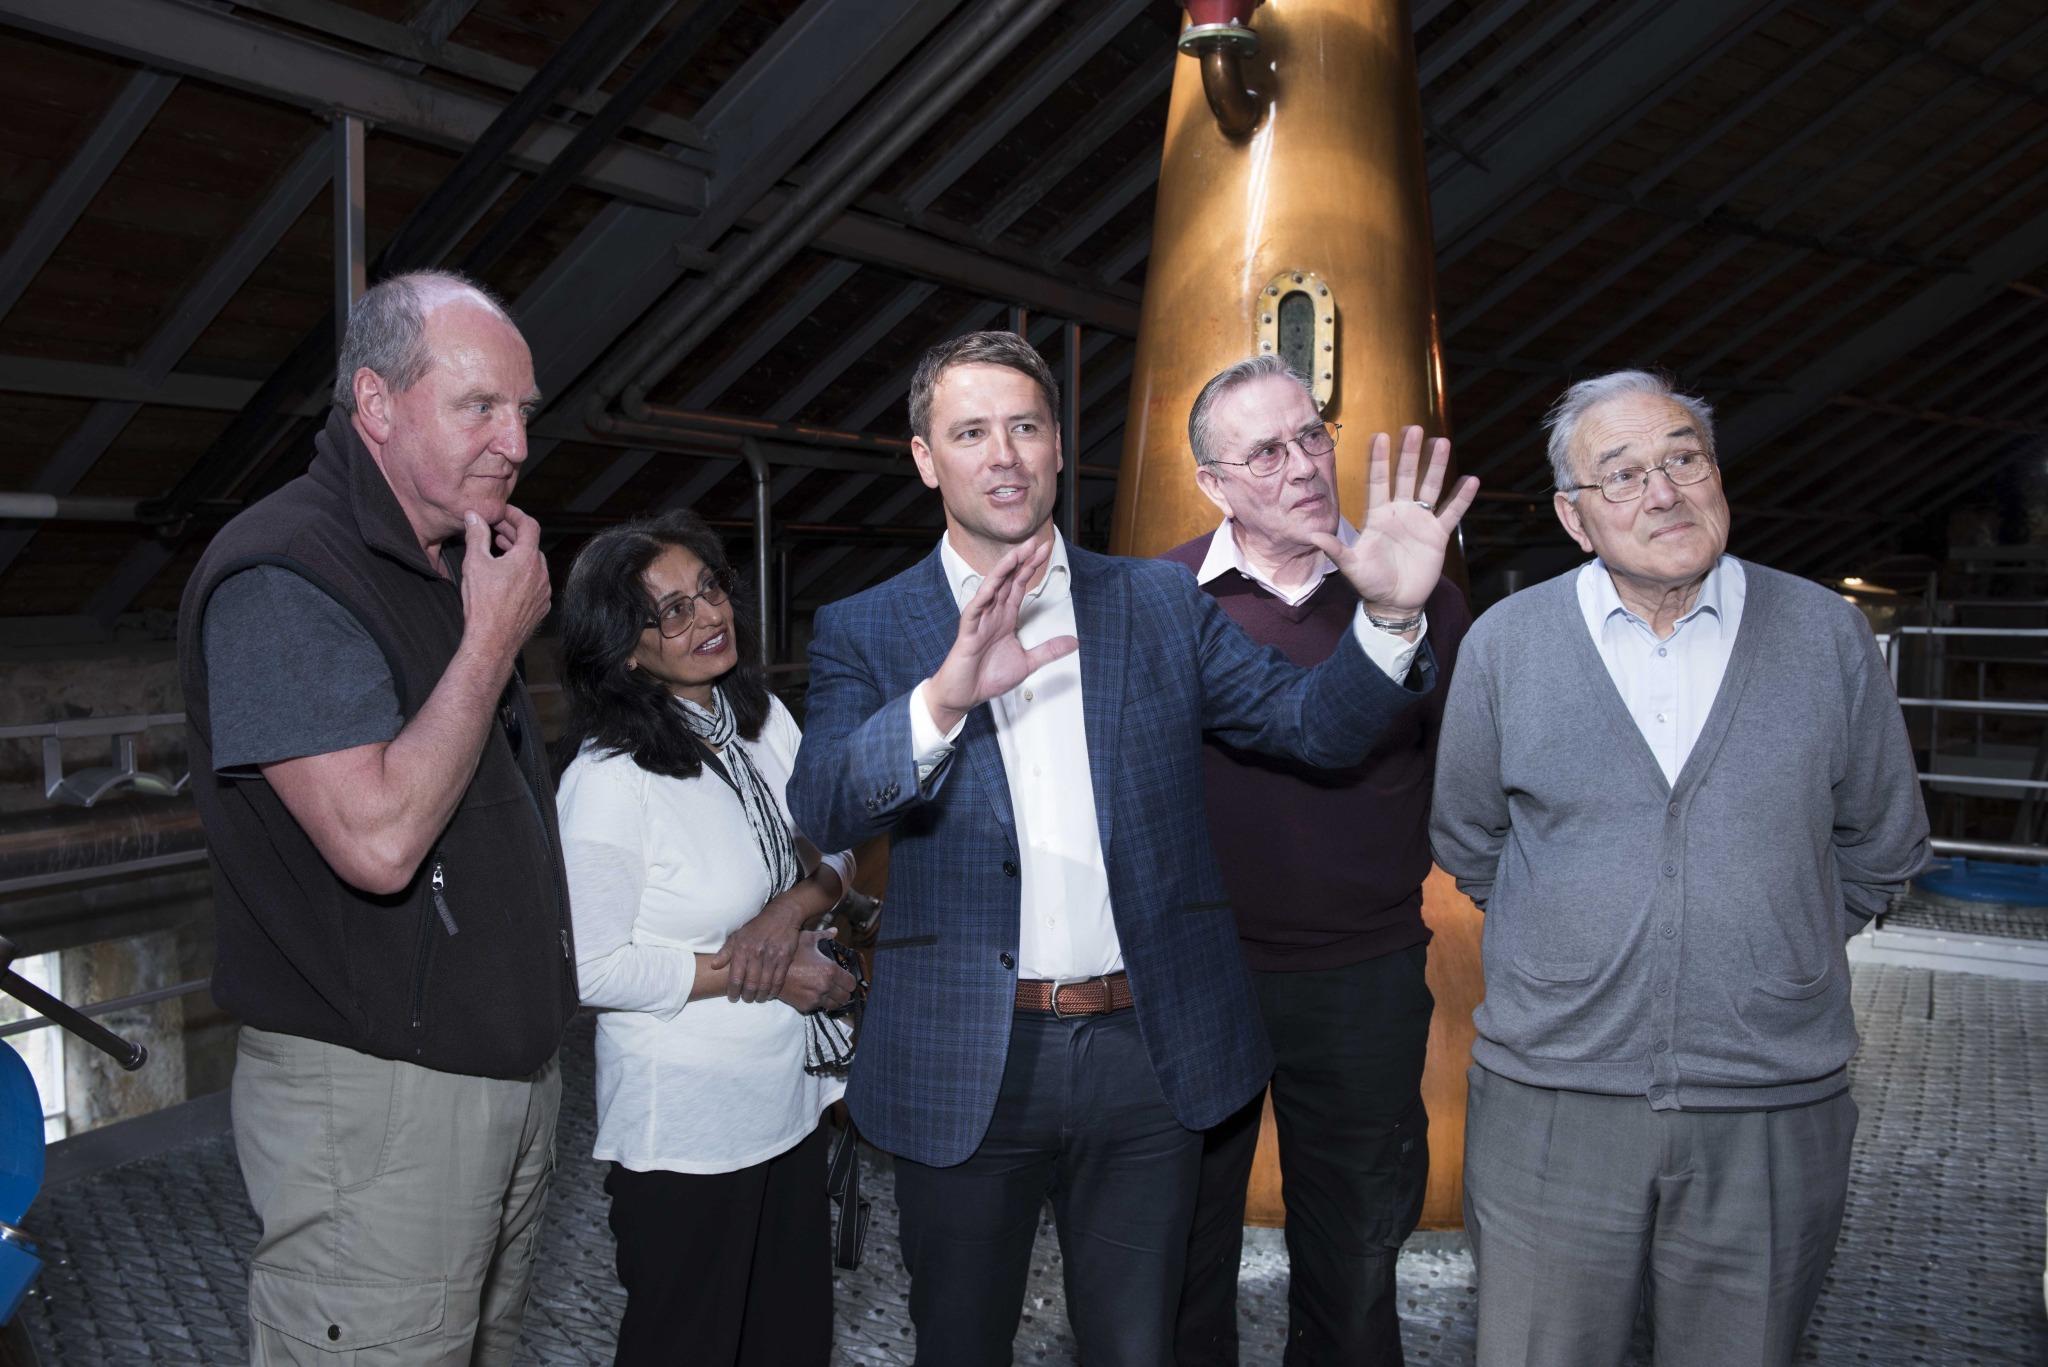 Michael Owen at the distillery